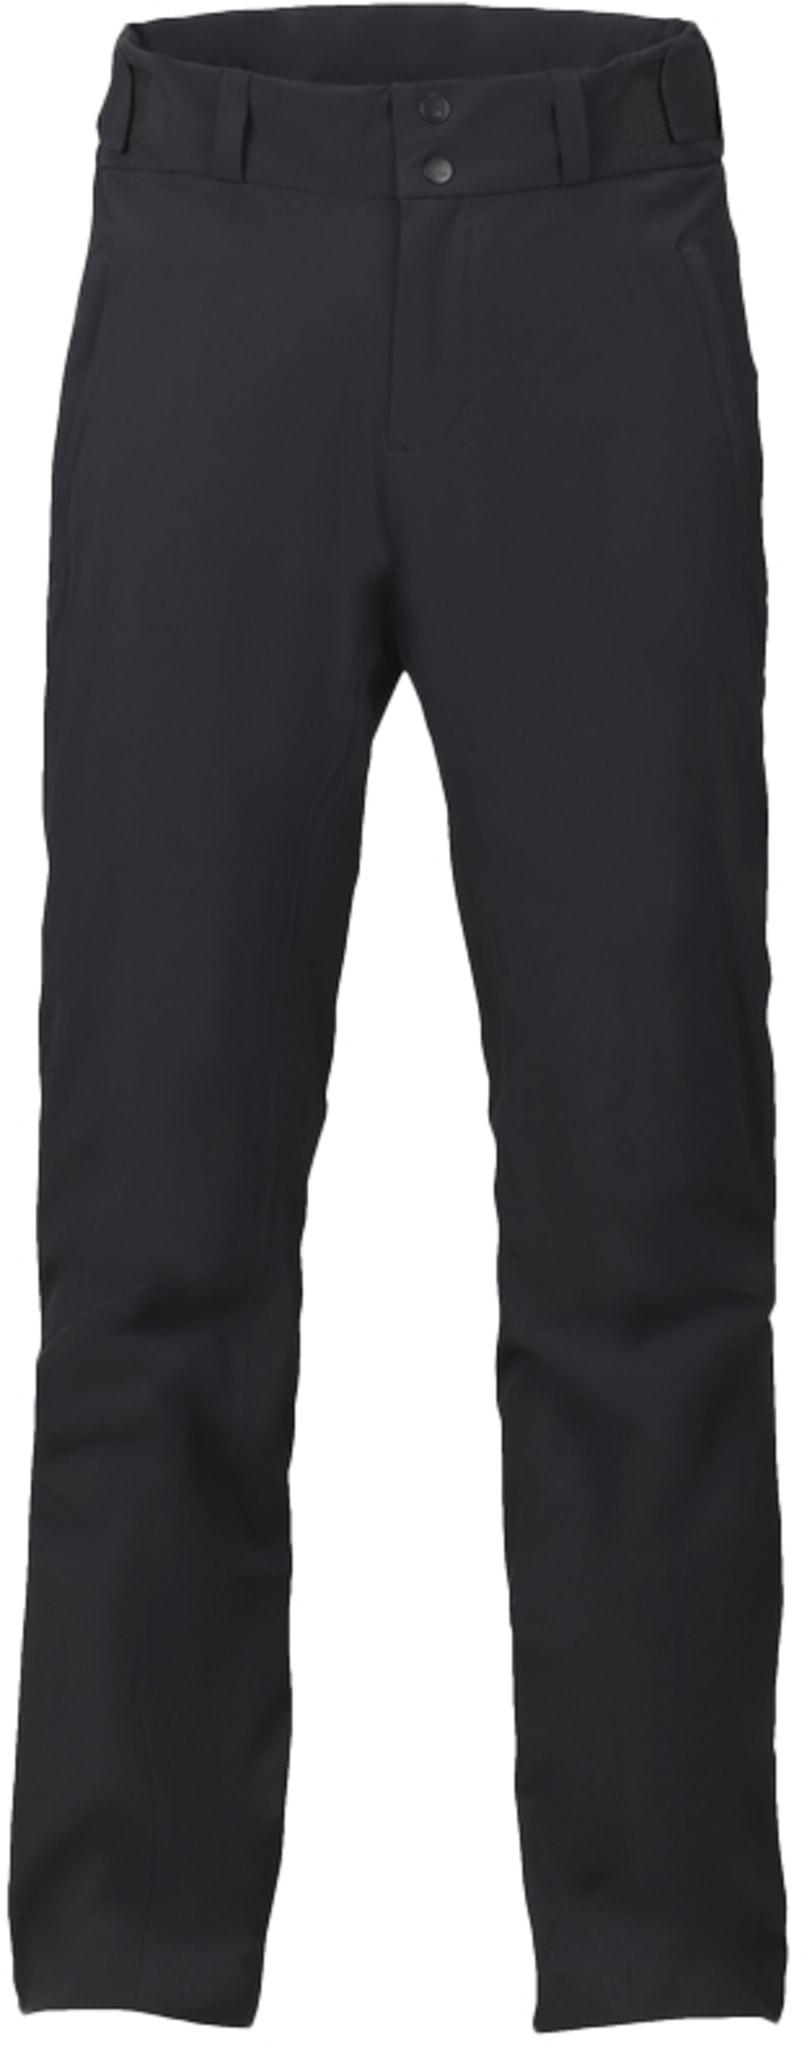 Curve Stretch Pants M